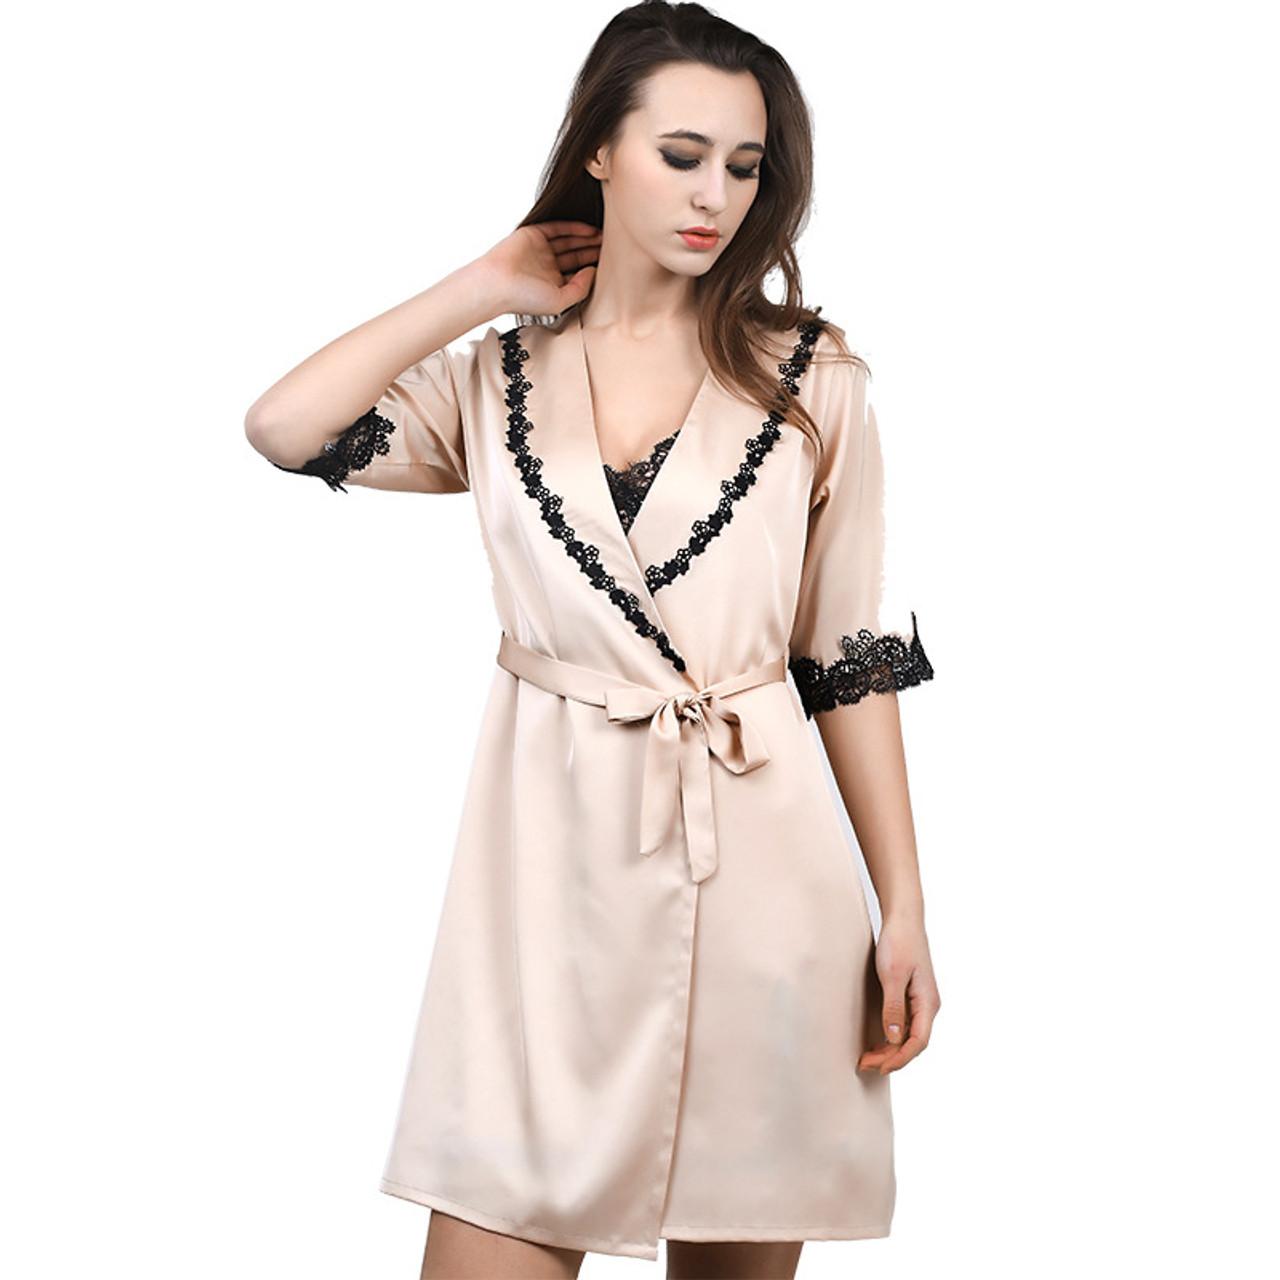 ... 1931 Sexy Women Lace Silk Satin Kimono Bathrobe Nightgown robe Sets  Half Sleeve Lingerie Pajamas Sleepwear ... 5c6c17e1b